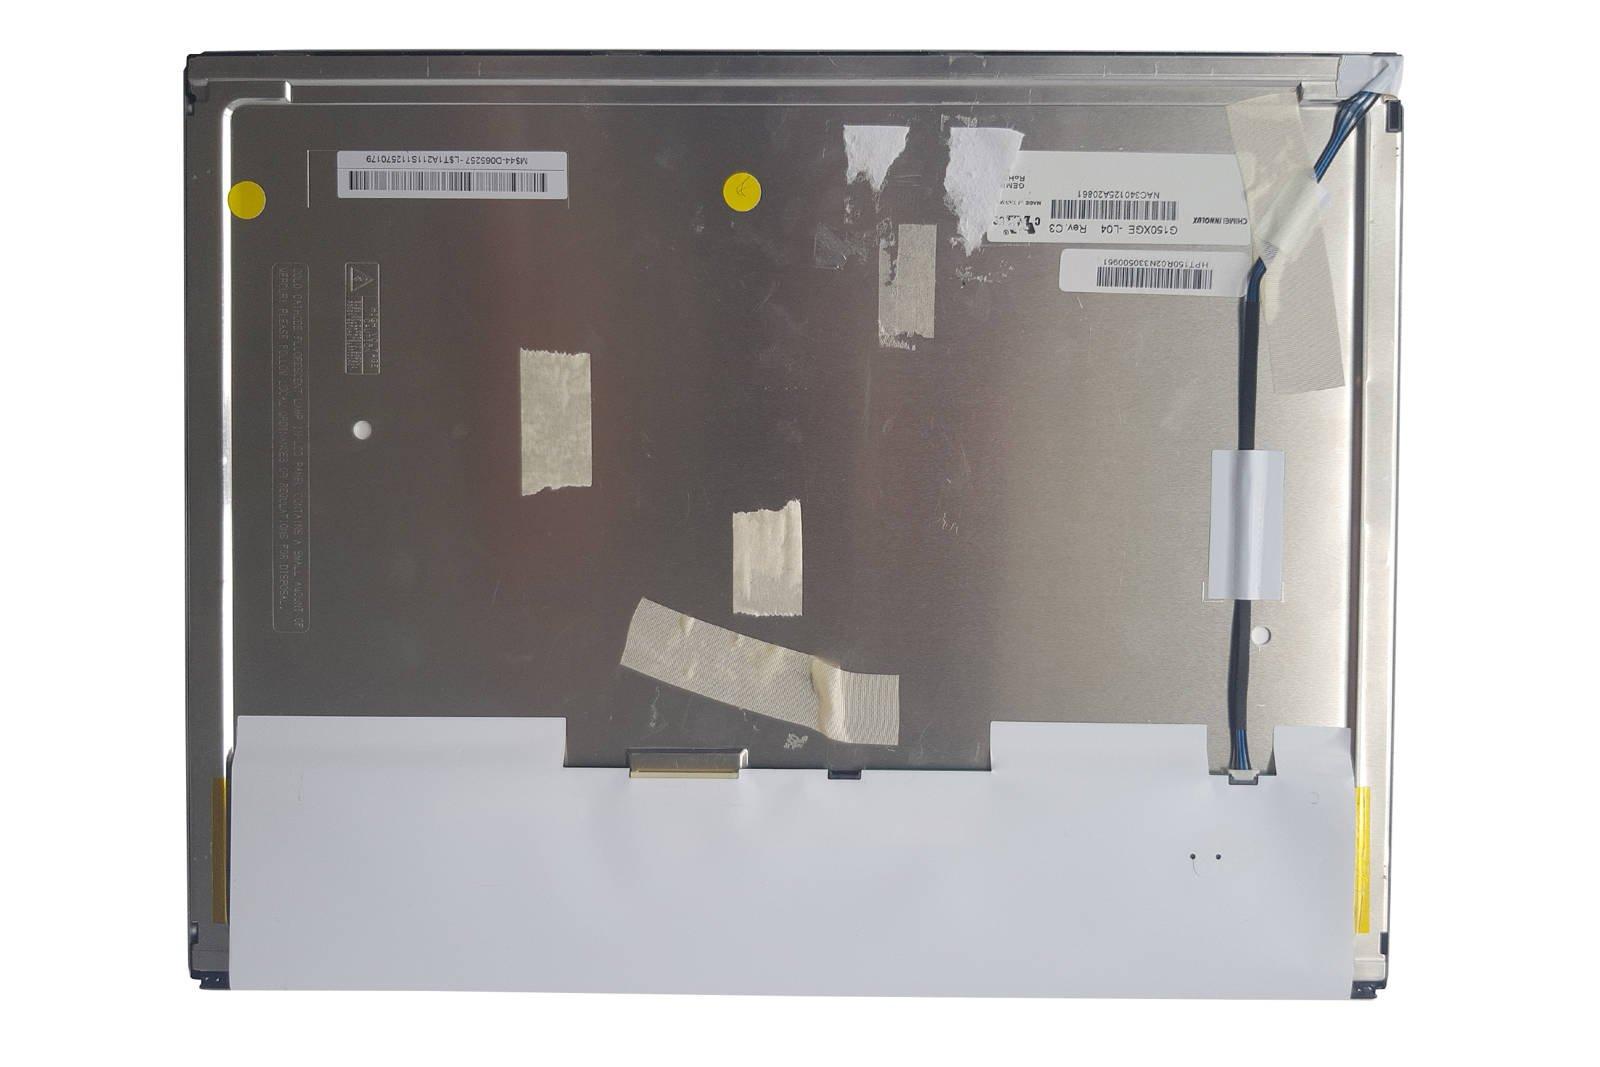 Display Panel Screen Innolux 15.0' G150XGE-L04 Rev. C3